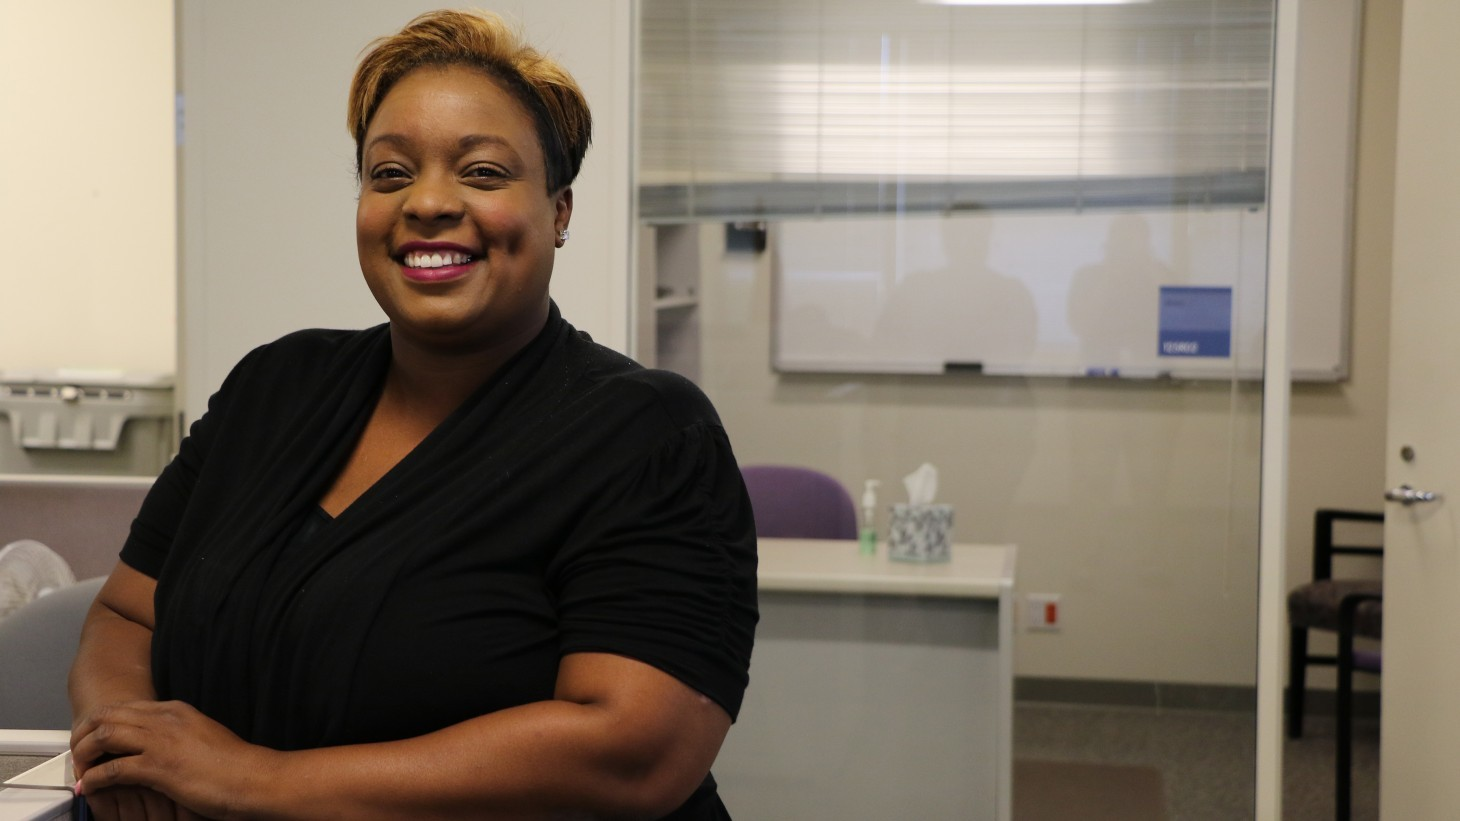 Joanna Harris, claims examiner and UBT labor co-lead, OPEIU Local 29 (Northern California Regional Office)